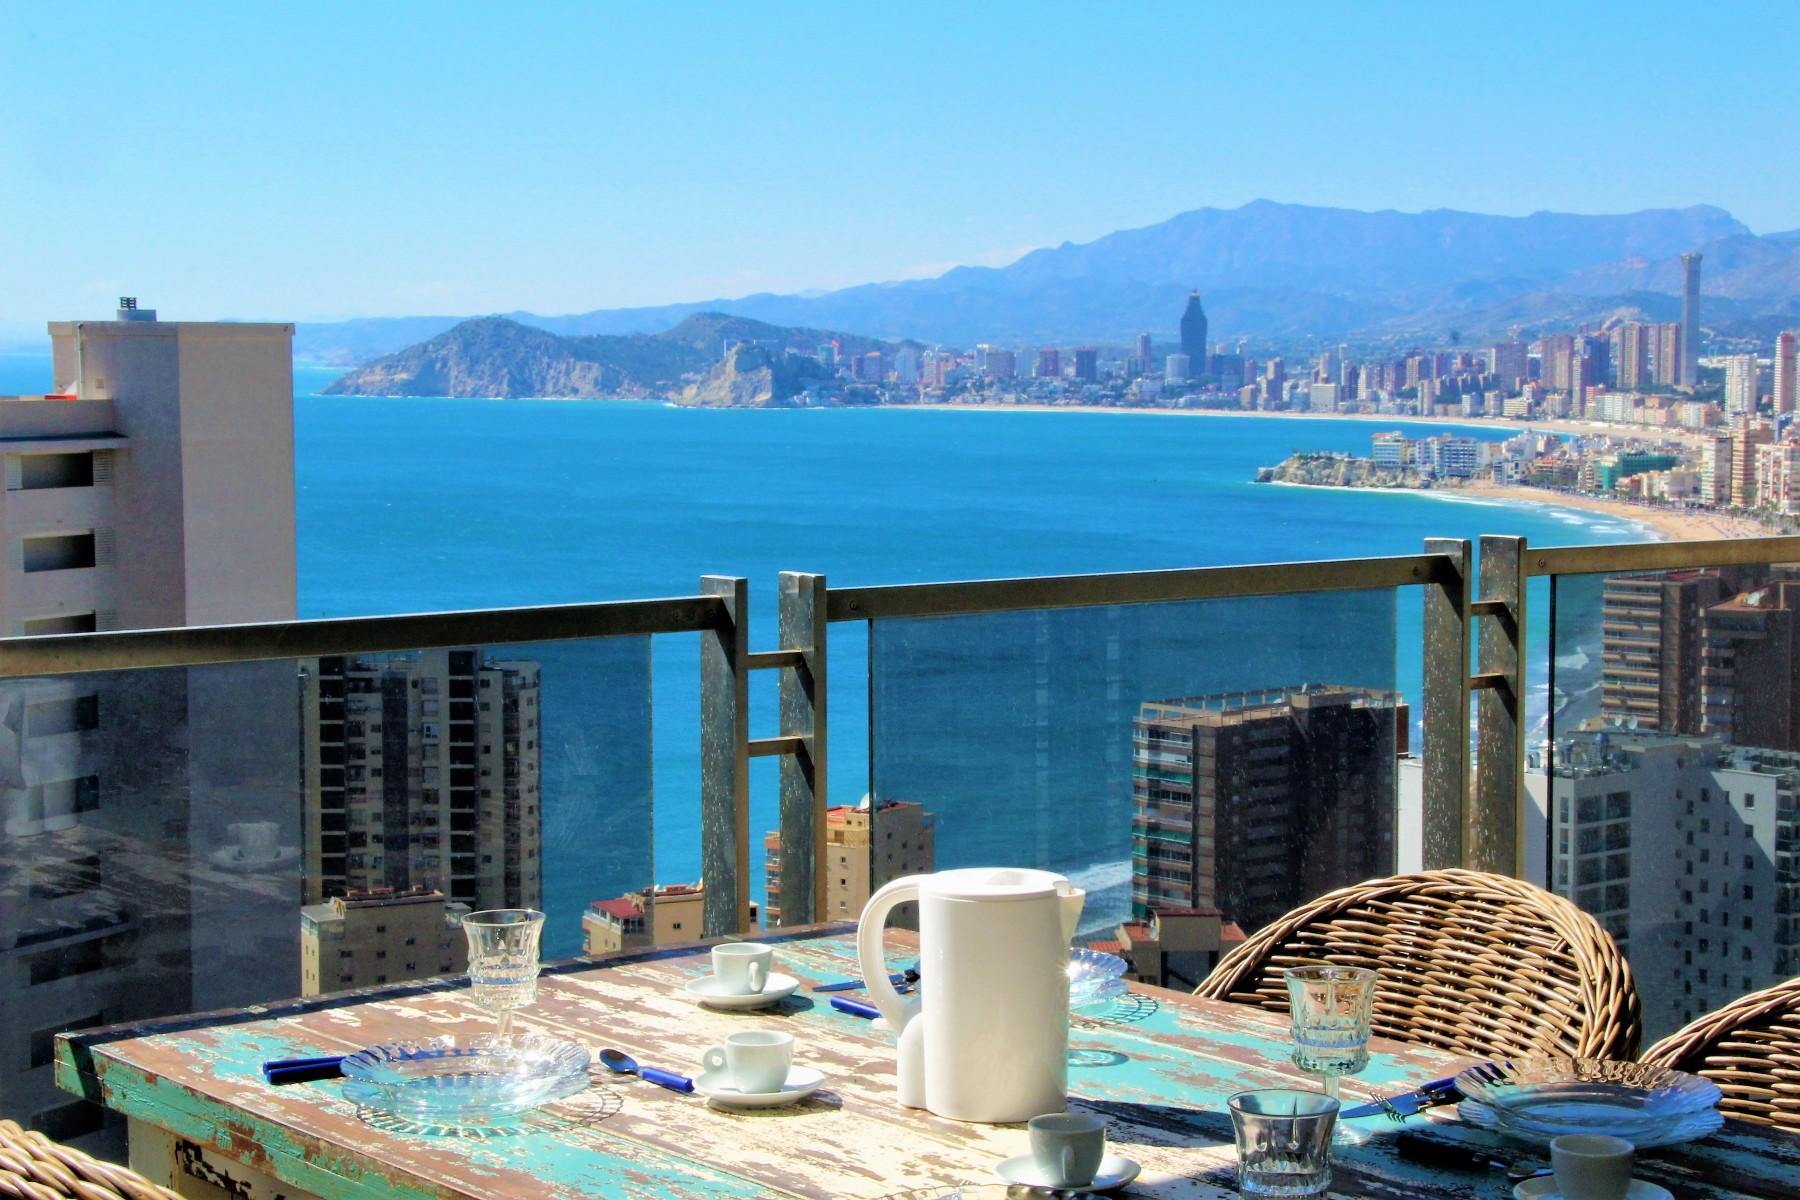 Apartments in benidorm mirador del mediterr neo 16 a for Mirador del mediterraneo